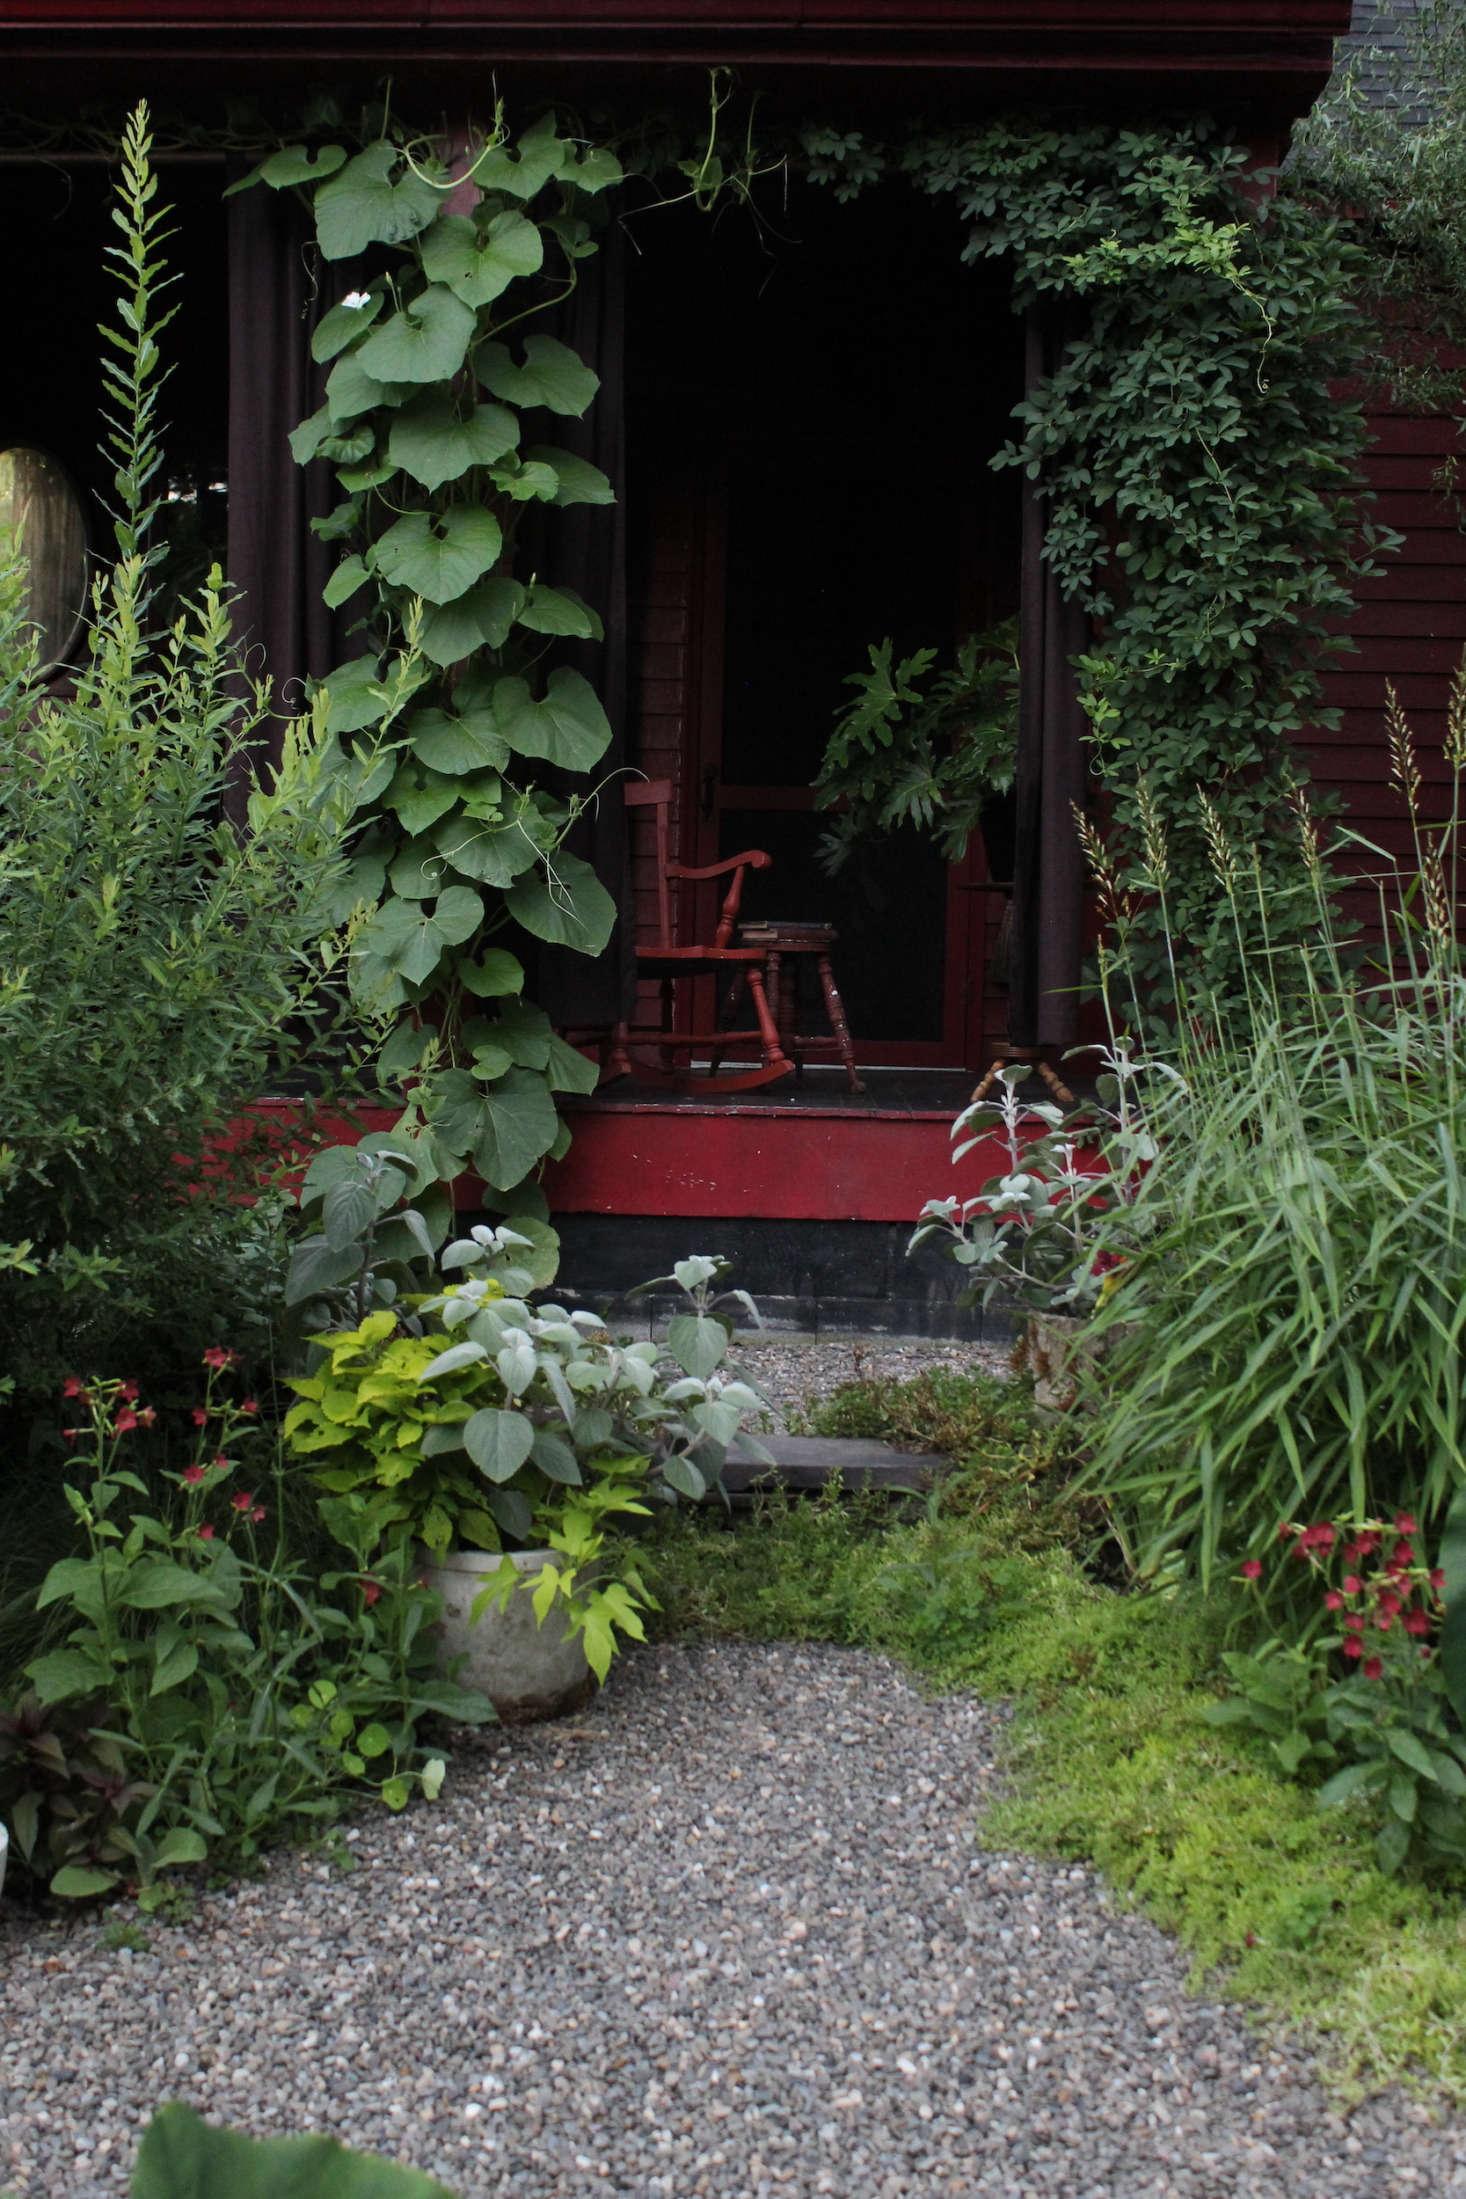 The large leaves of a climbing calabash (Lagenaria siceraria) vine help enshroud the porch. &#8